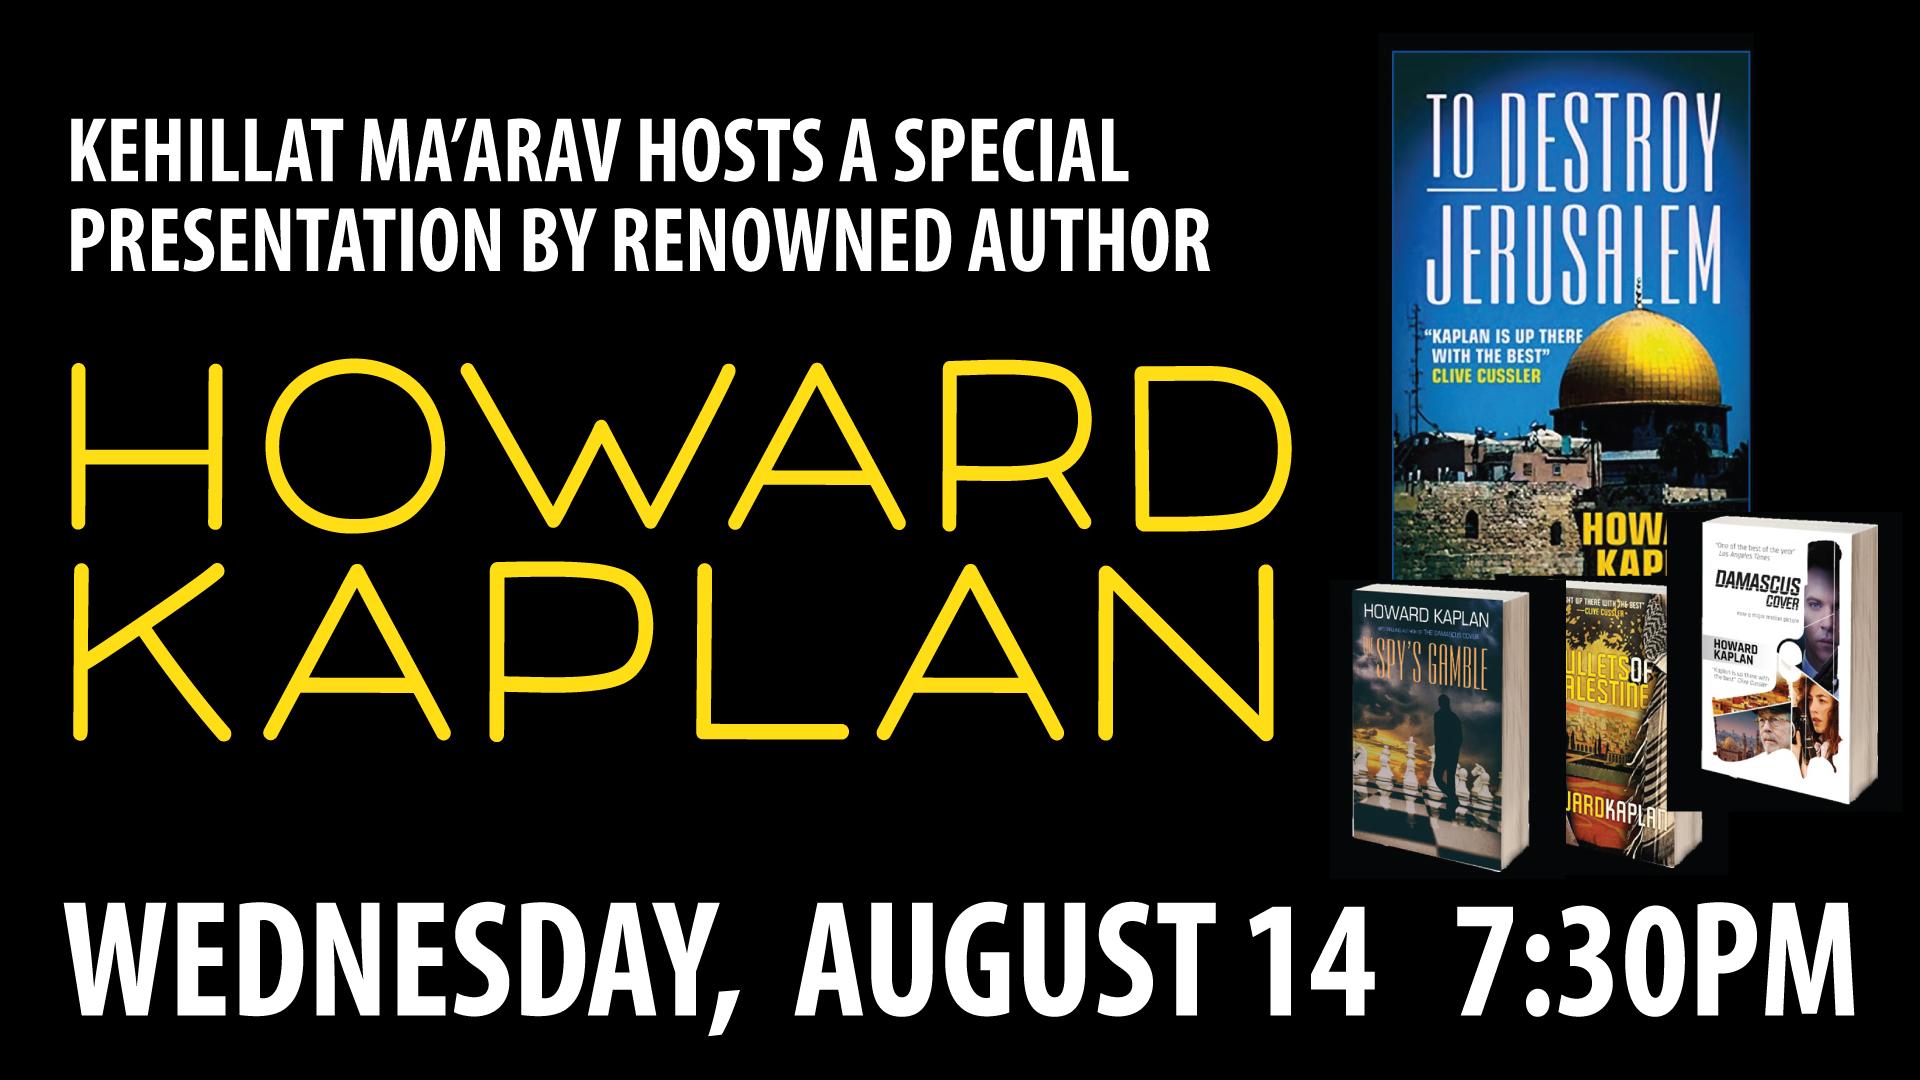 Author Howard Kaplan